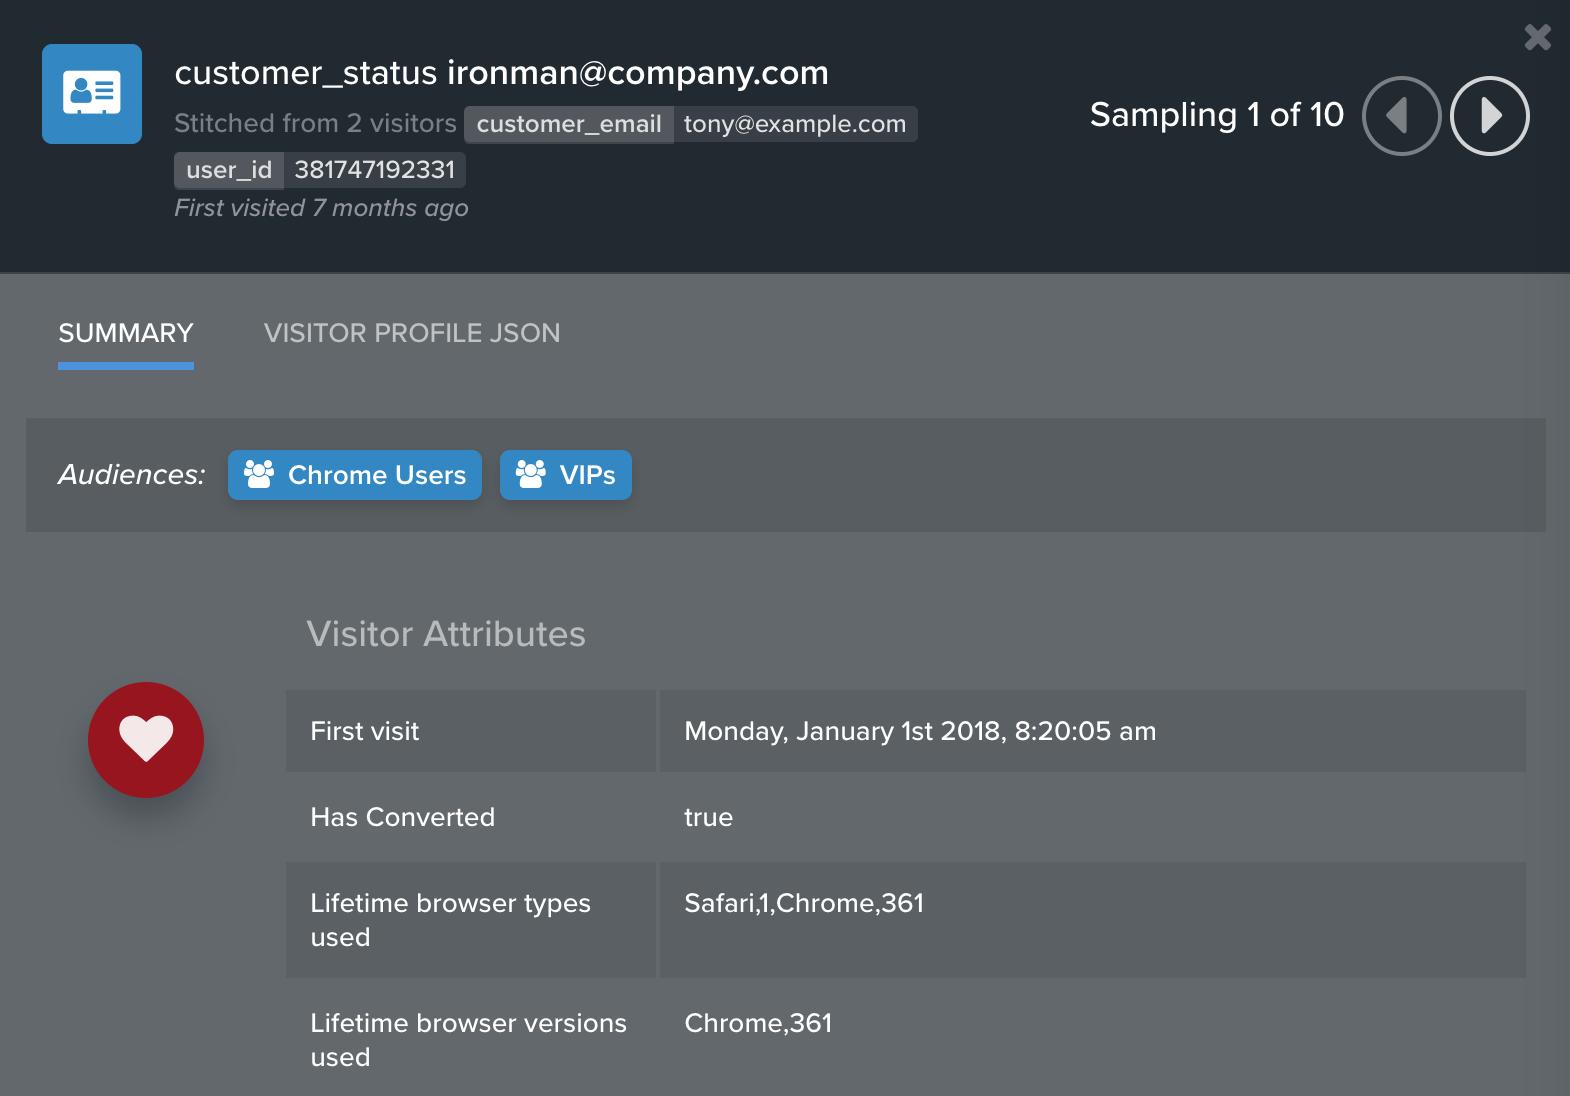 visitor-profile-sampler-detail-summary.png